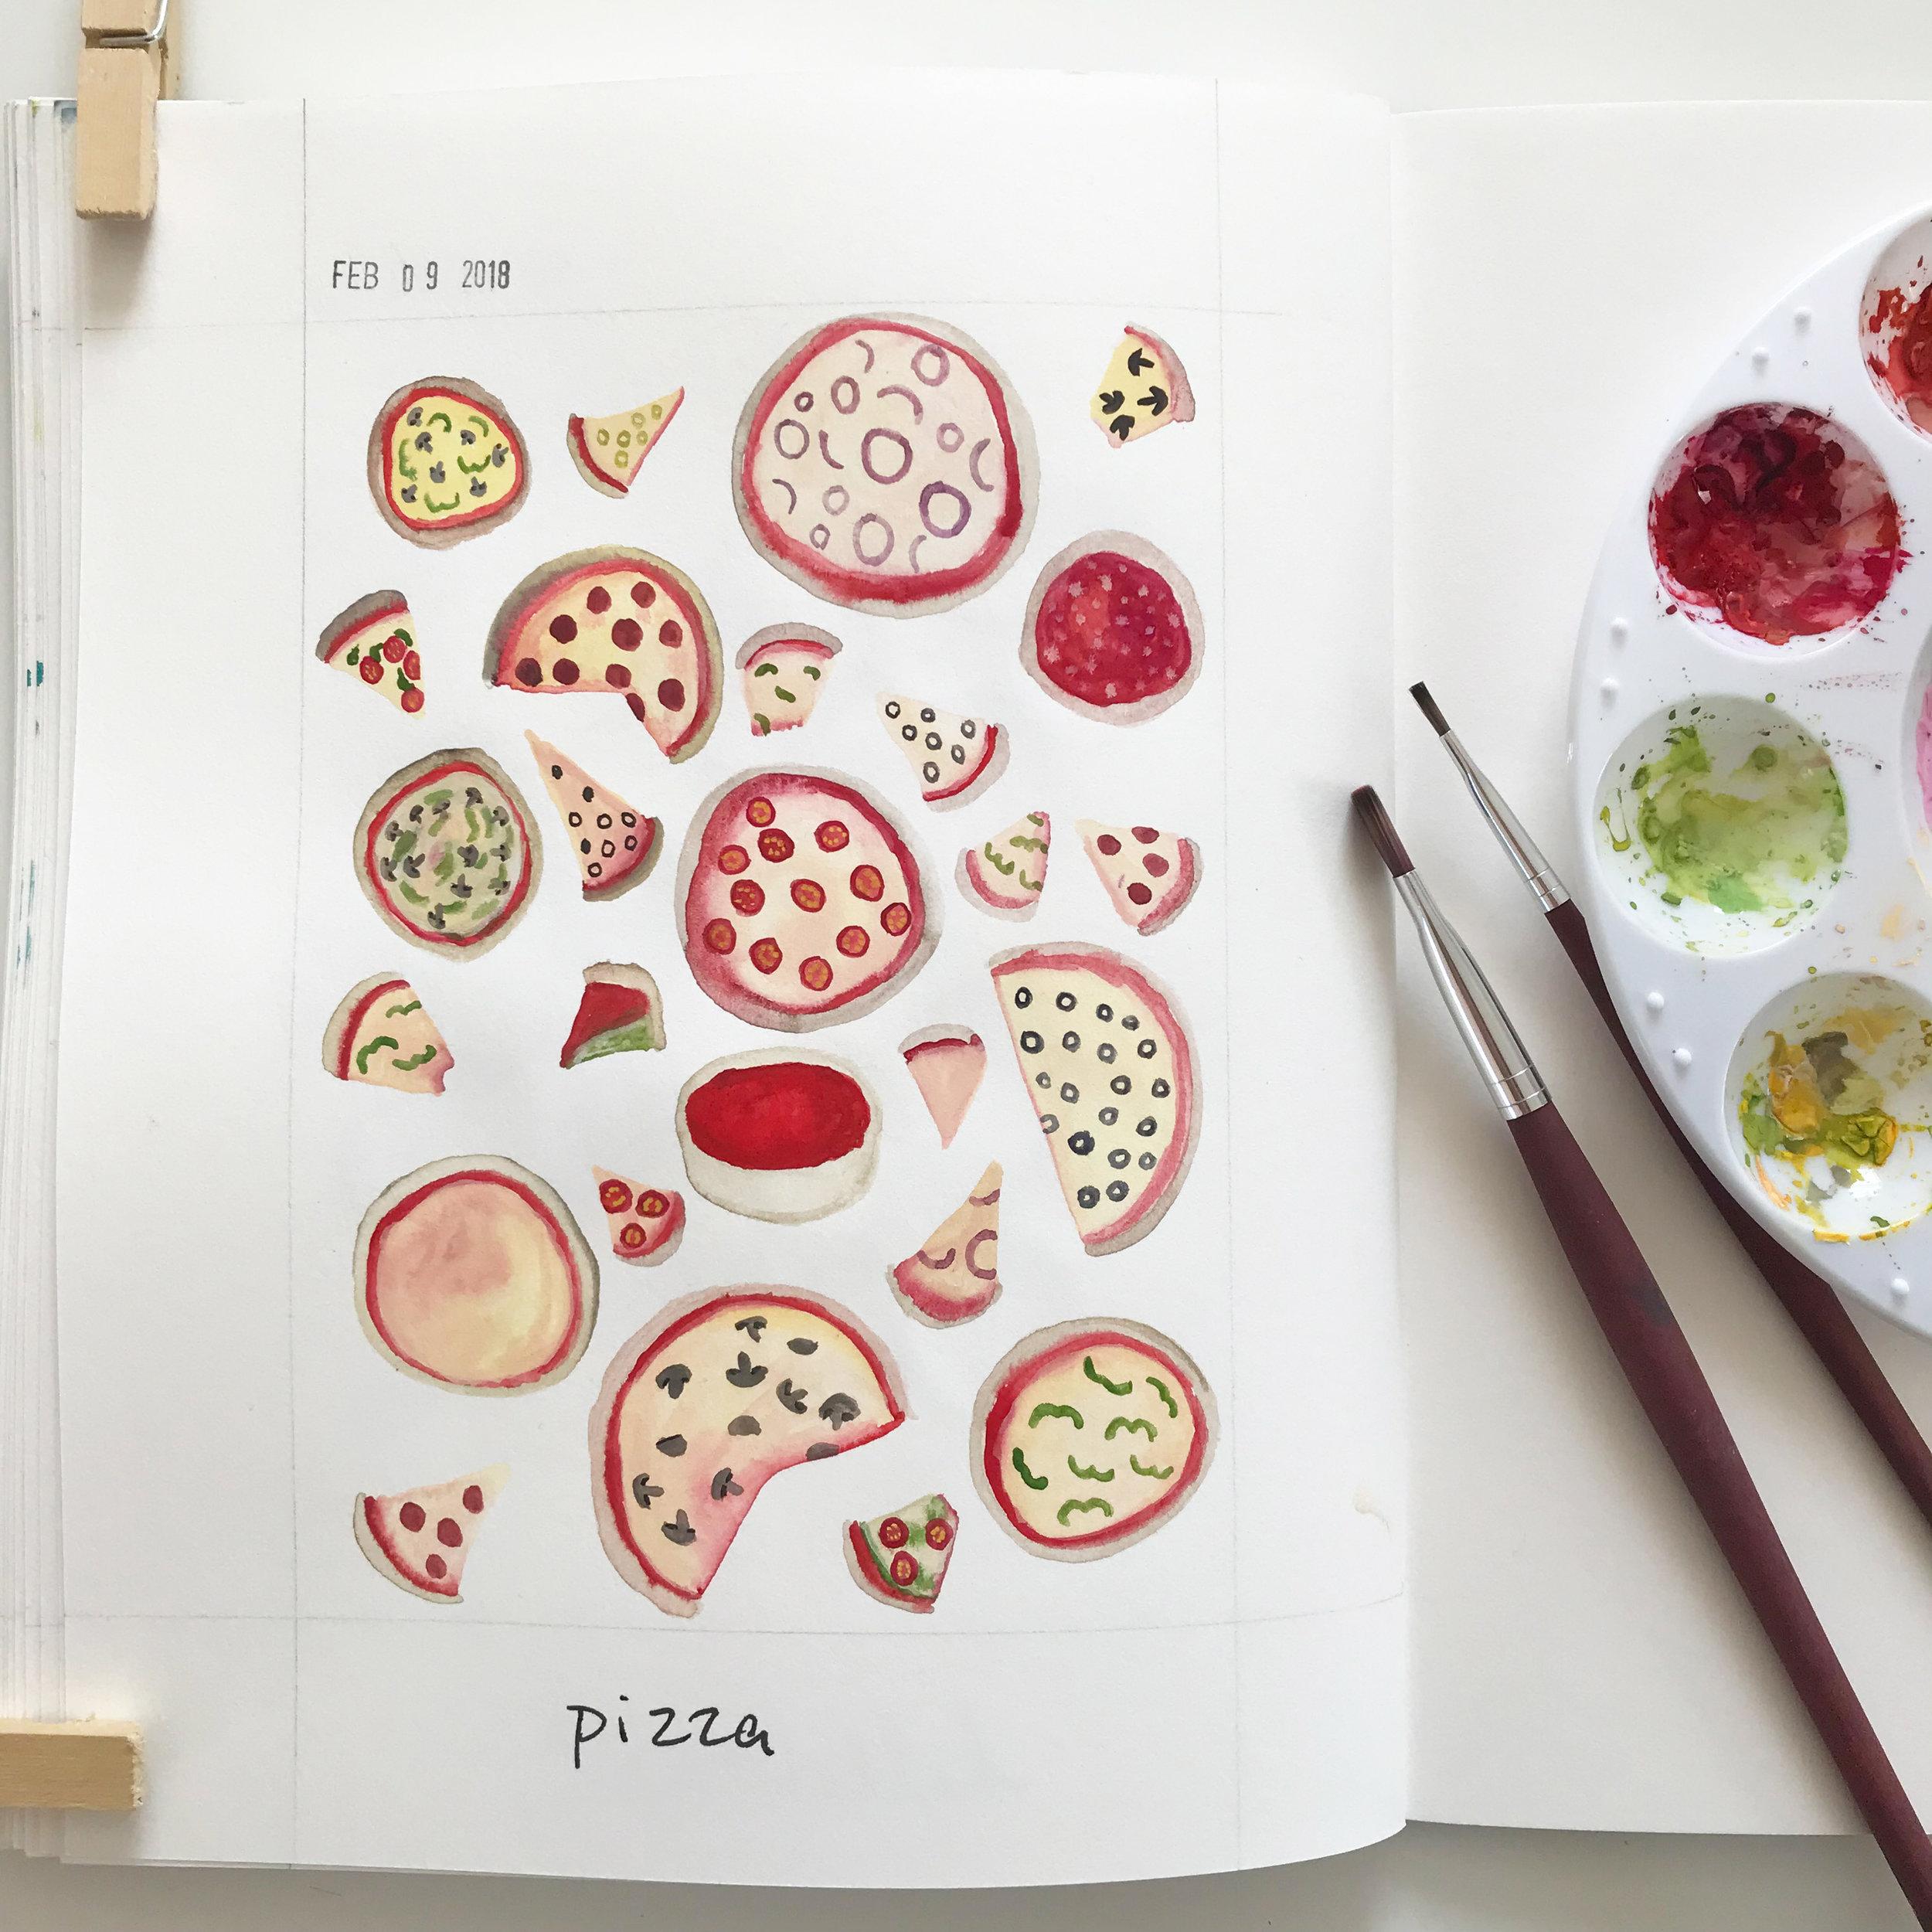 Gouache Pizza Sketches in Anne Butera's Sketchbook